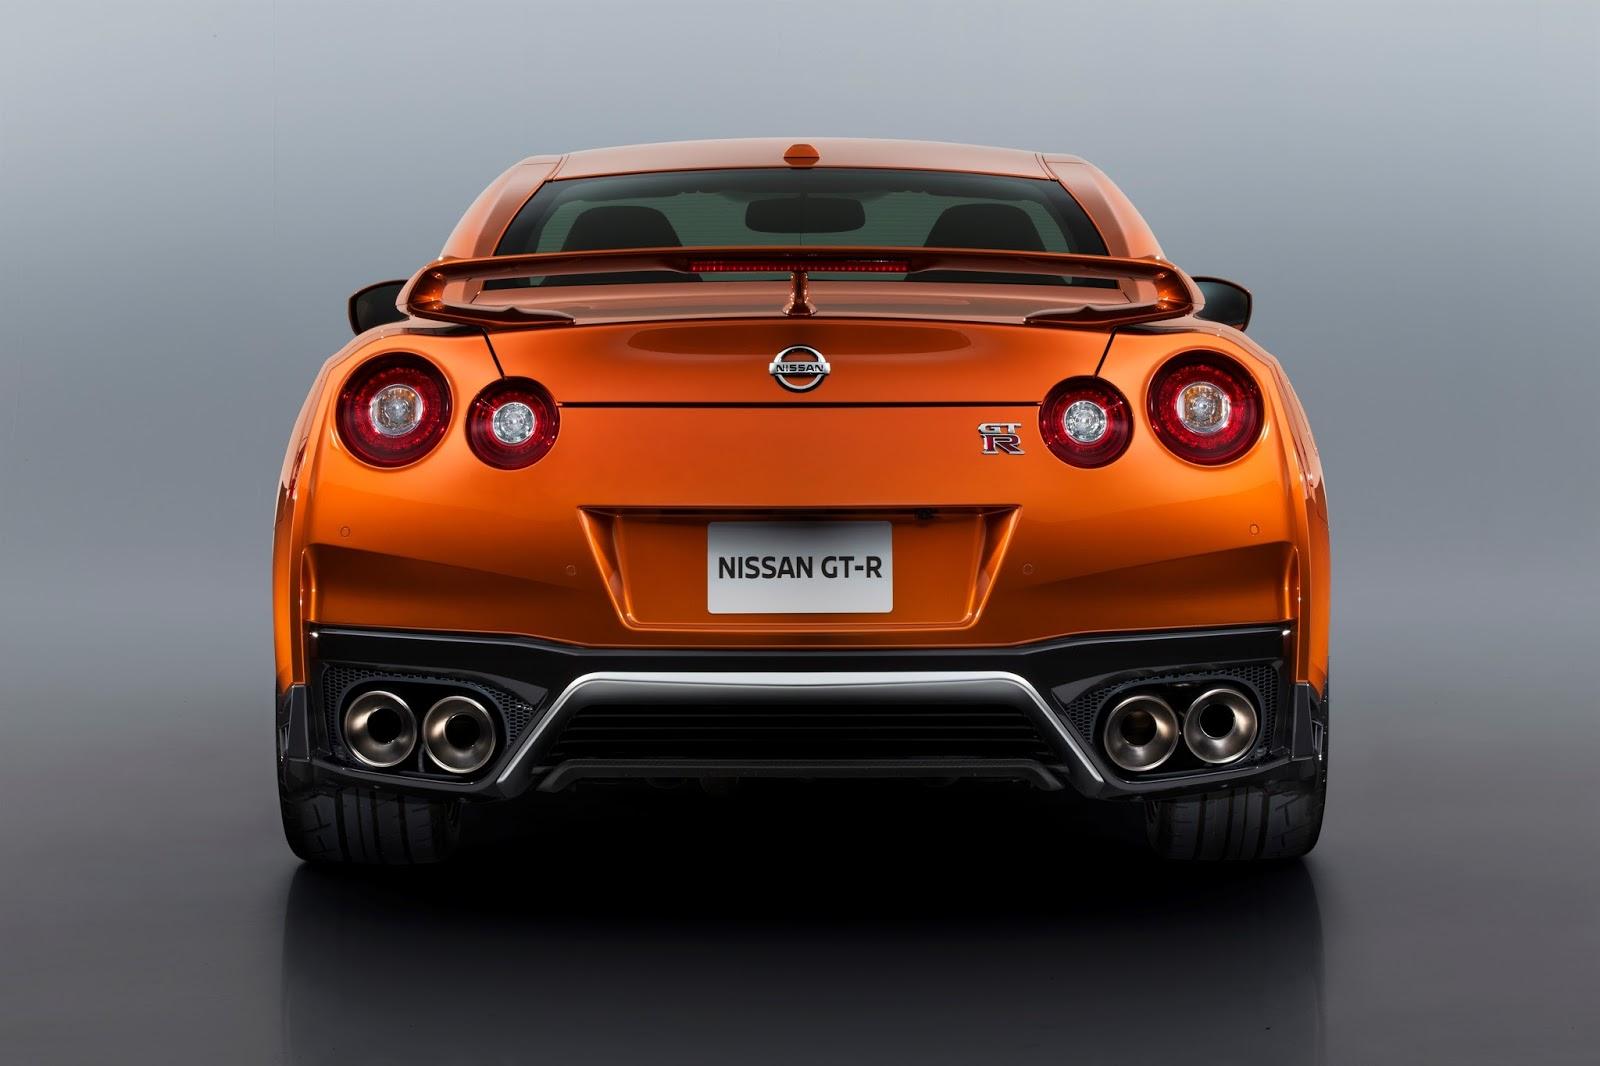 144063 1 5 Nissan GT-R: Ο Godzilla επέστρεψε! Godzilla, Nissan, Nissan GT-R, supercars, έκθεση Νέας Υόρκης